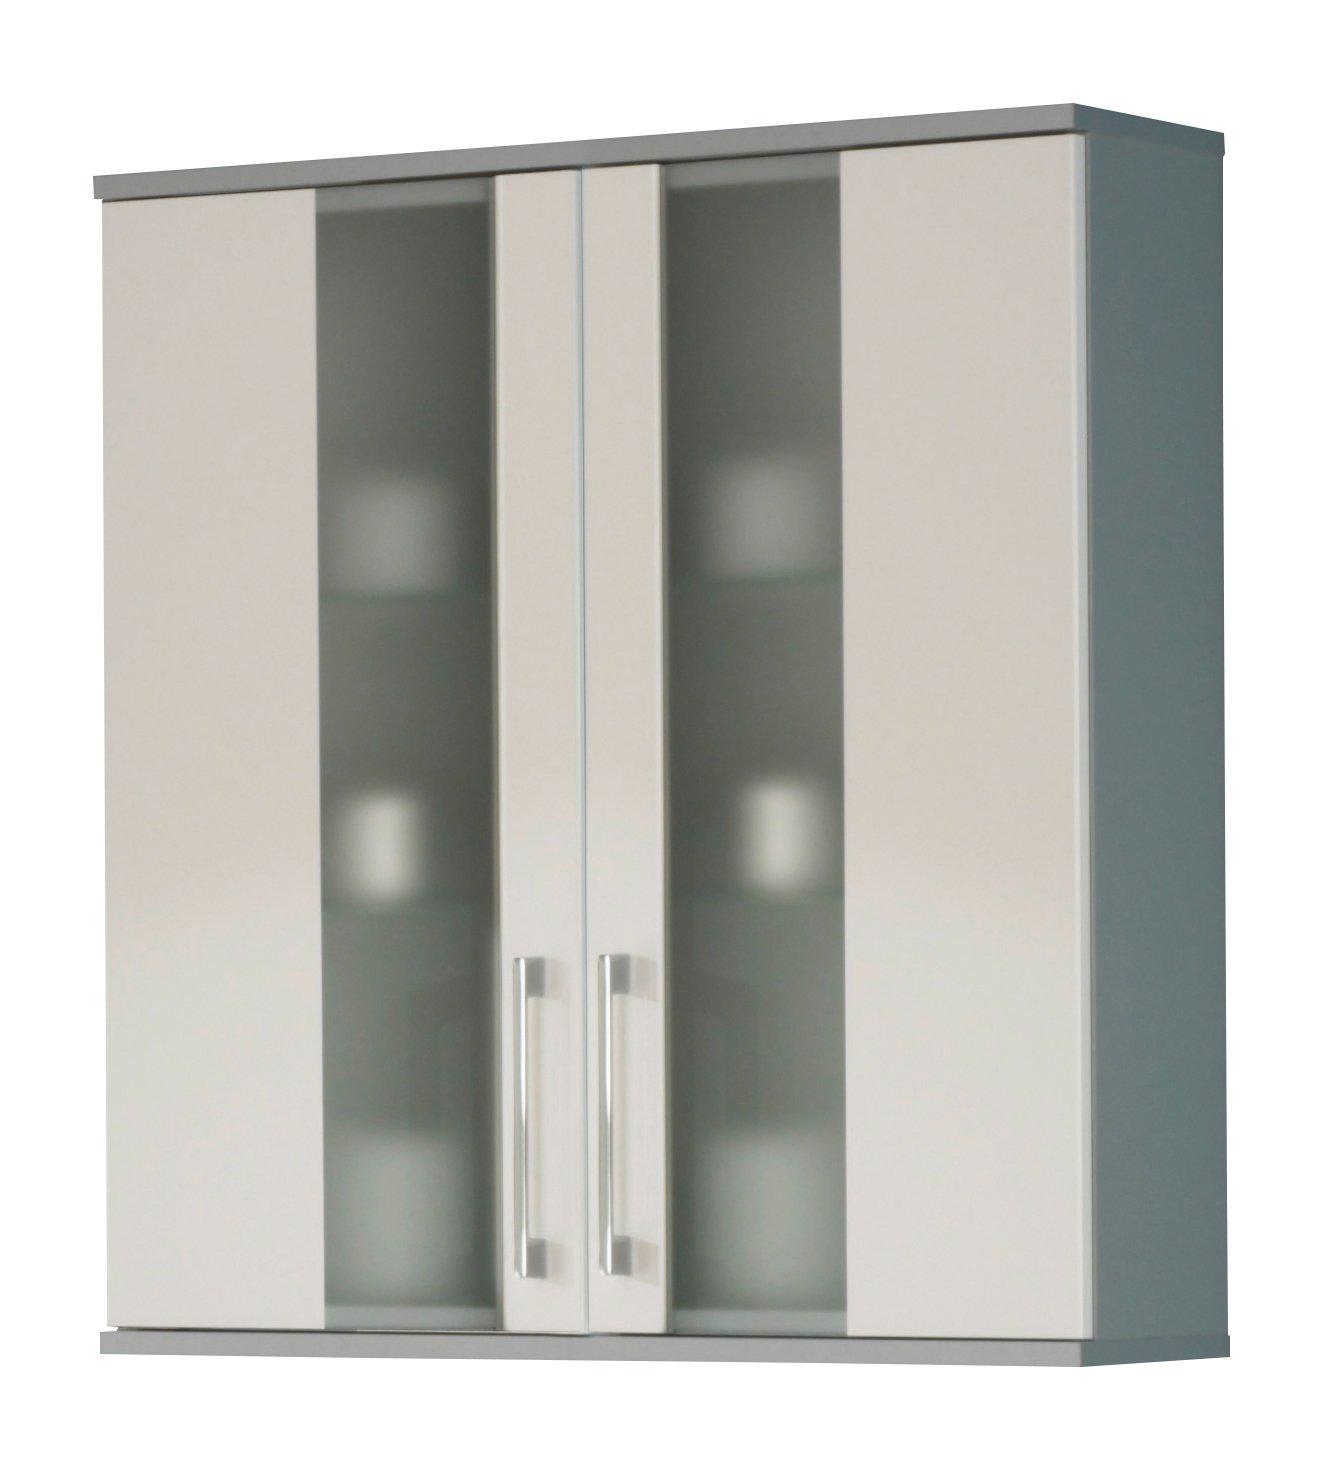 Kesper Badmöbel 5510910764101000 Hängeschrank Rimini, 2 Türen, 73,5 x 65 x 21 cm, alu weiß